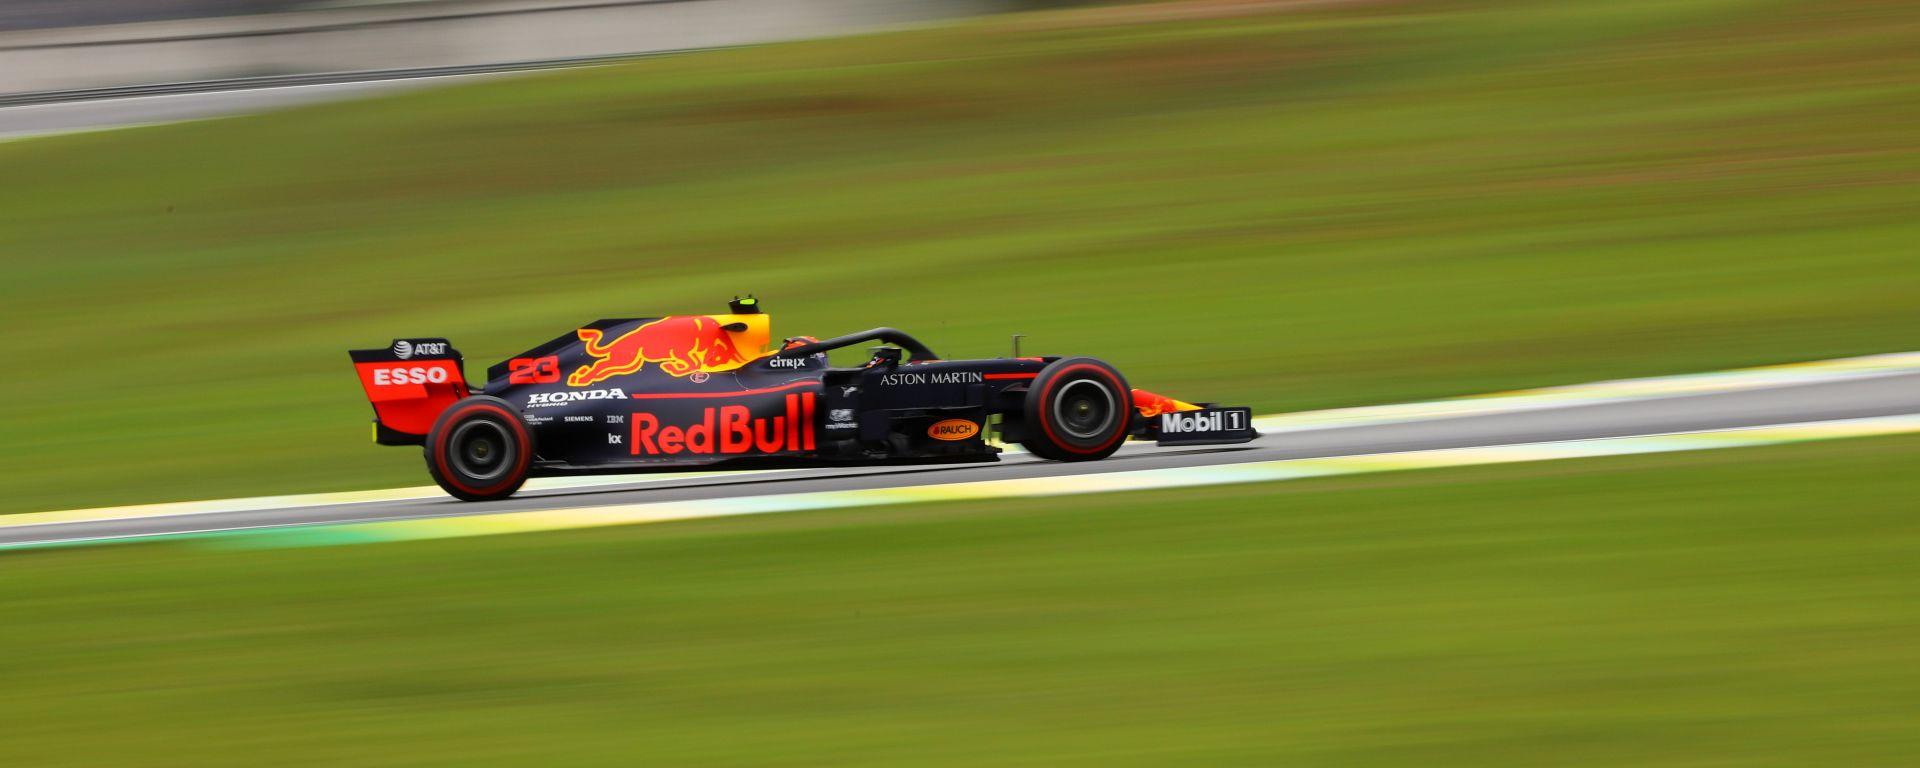 F1 GP Brasile 2019, Interlagos: Alexander Albon (Red Bull)